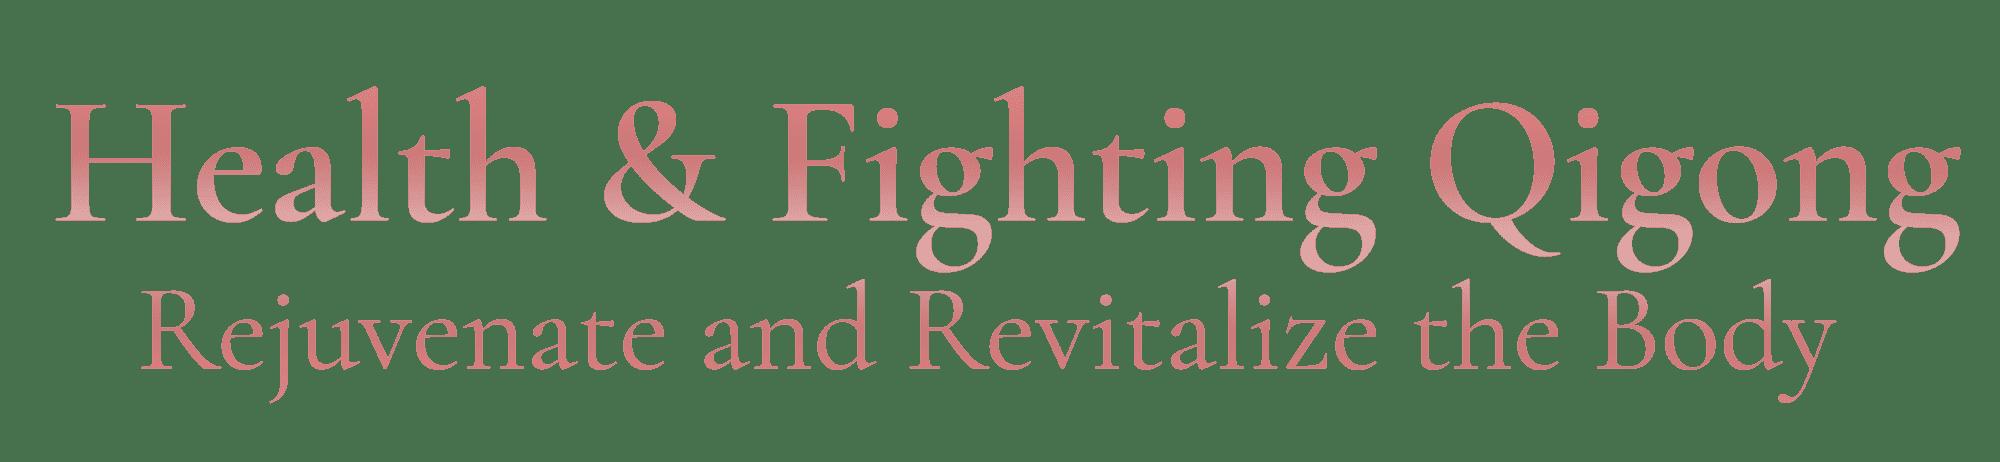 health qigong and fighting qigong by grandmaster jiang yu shan